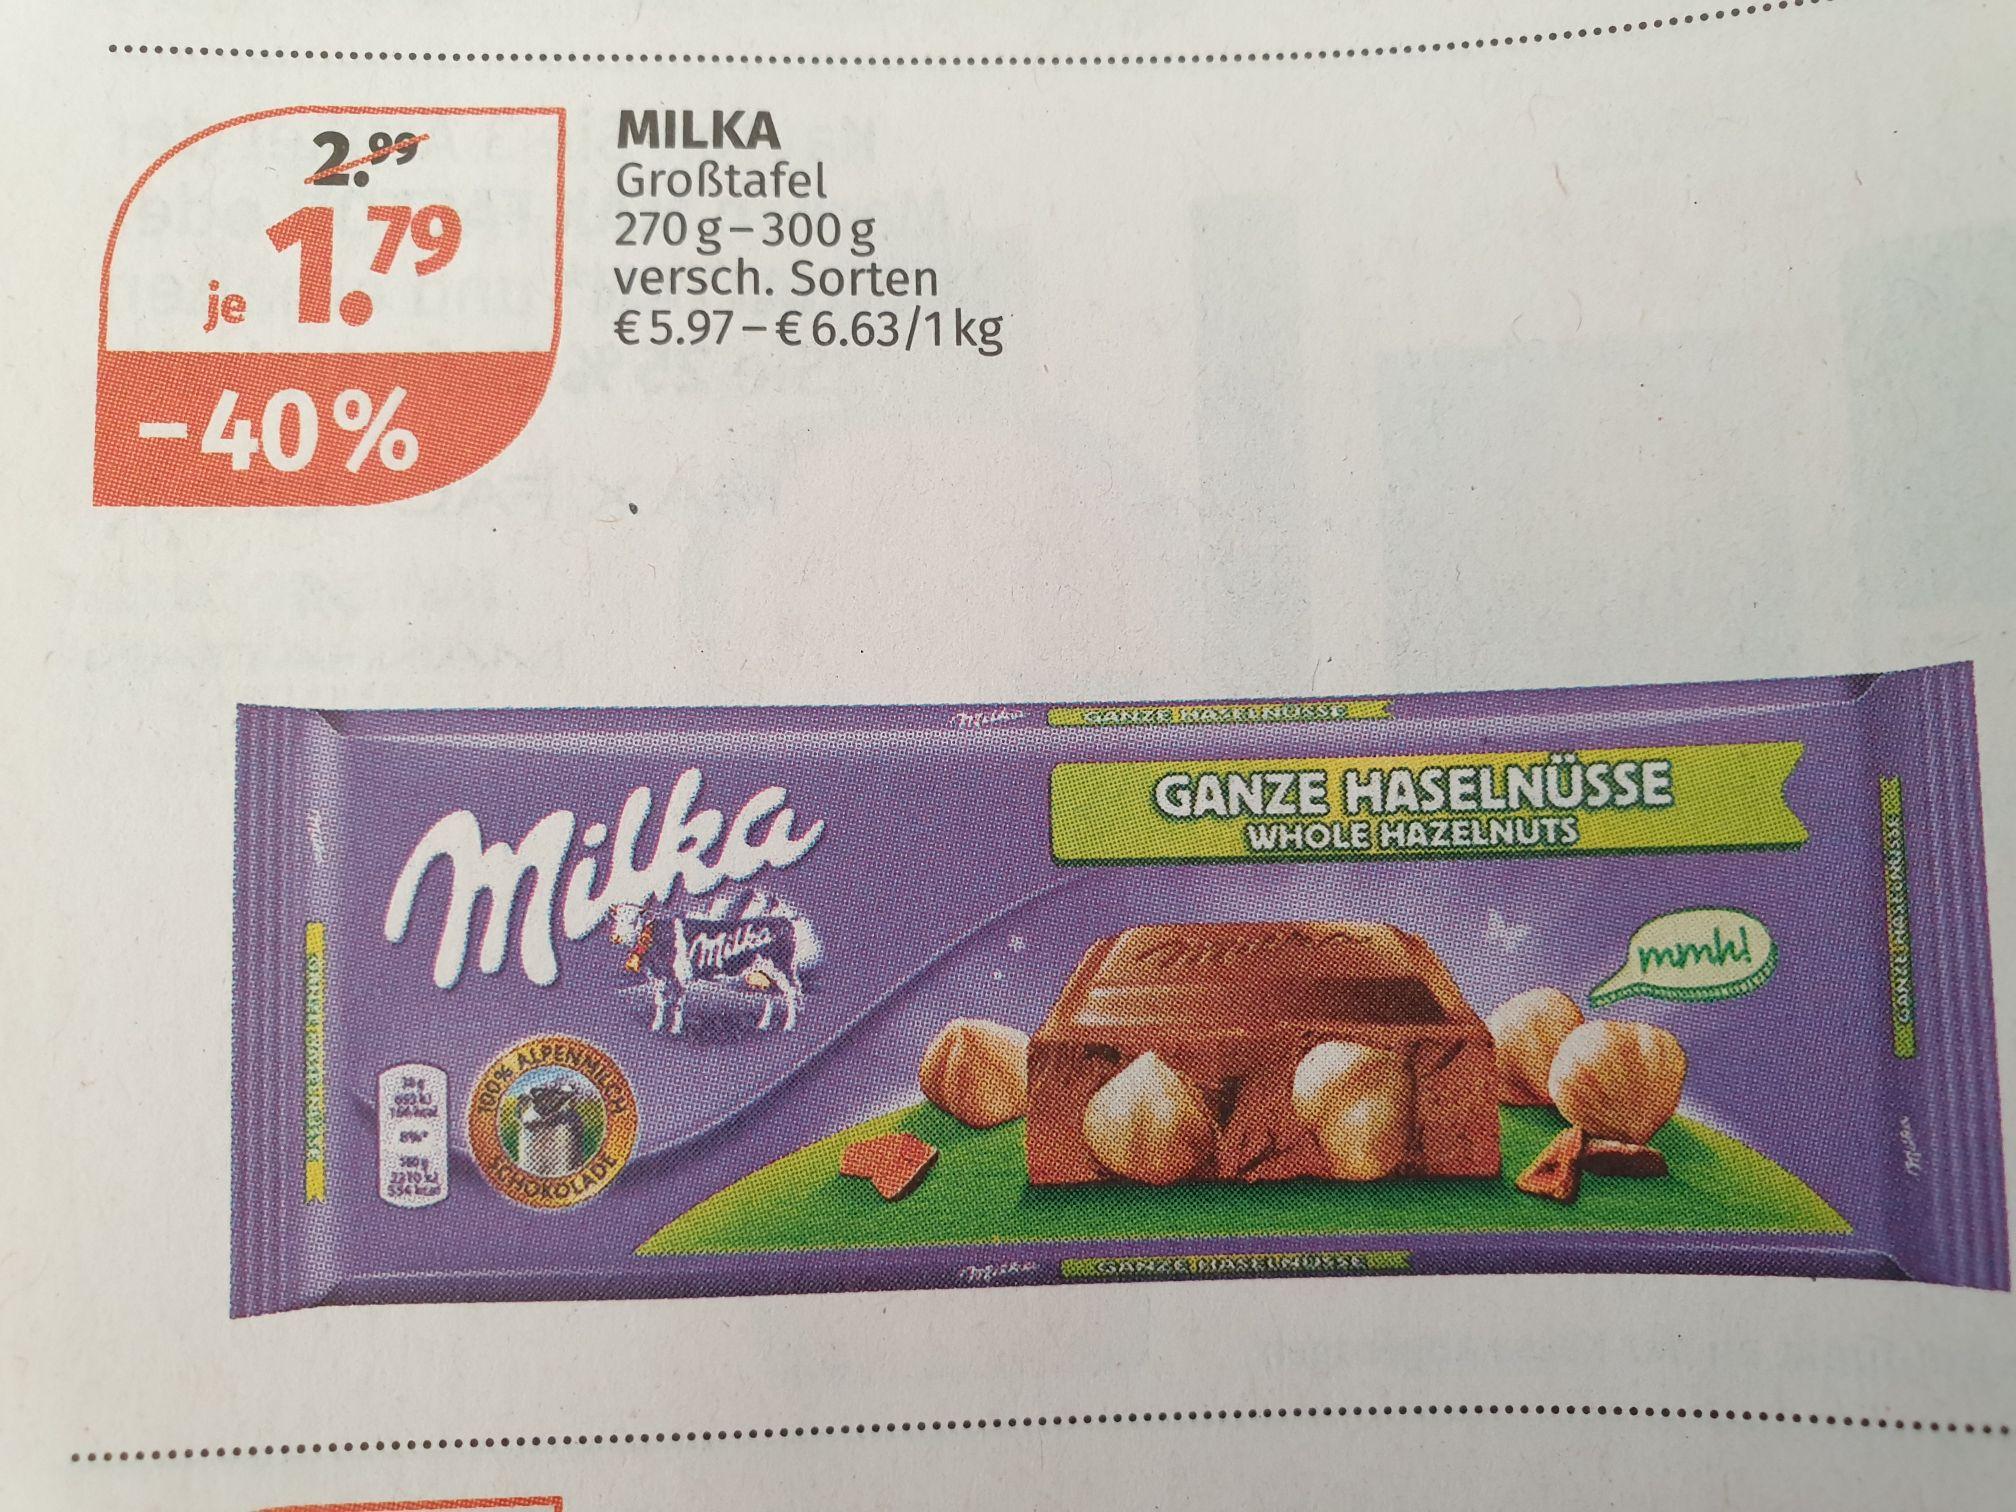 MILKA 300g bei Müller um 1.79€